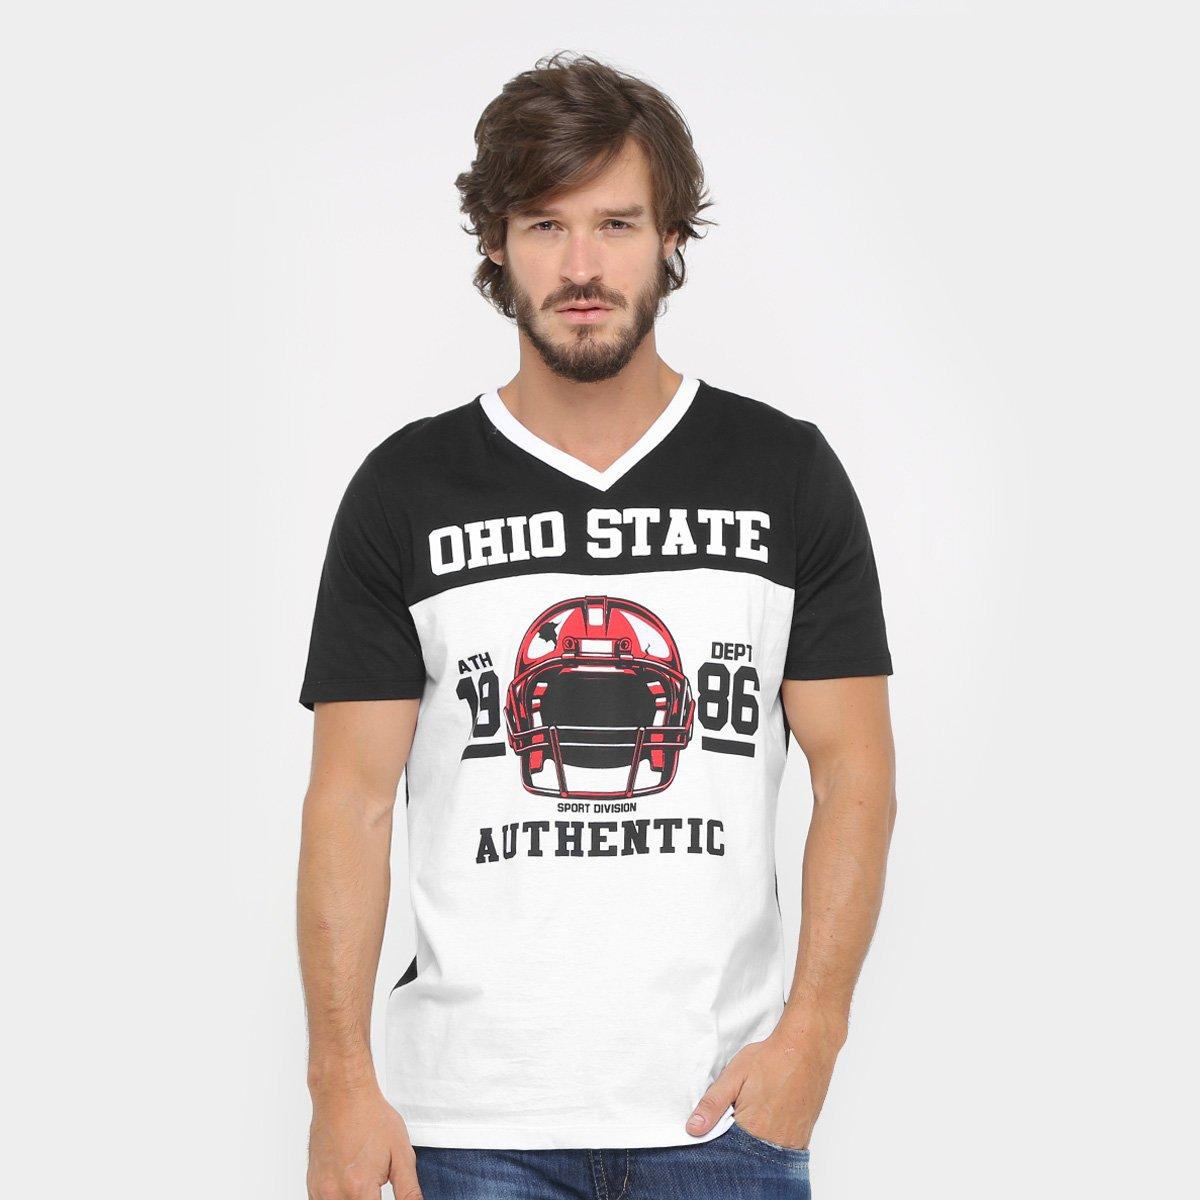 Camisa de Futebol Americano Gonew Leagues Ohio State - Compre Agora ... ee3d4369cbf3f